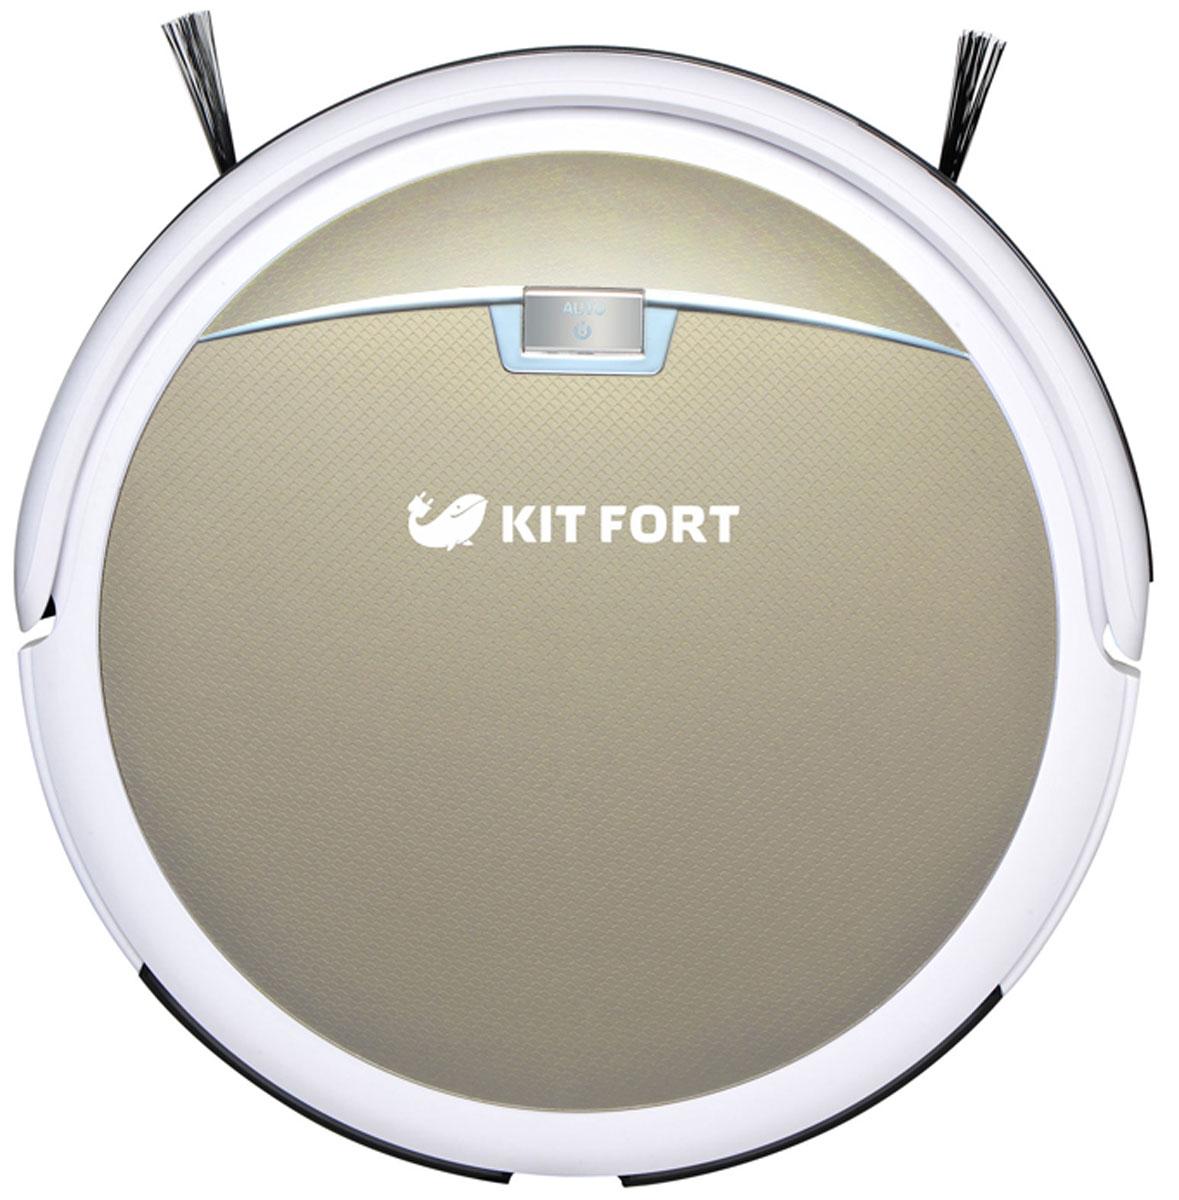 Kitfort KT-519-3, Gold робот-пылесос ( KT-519-3 золото )